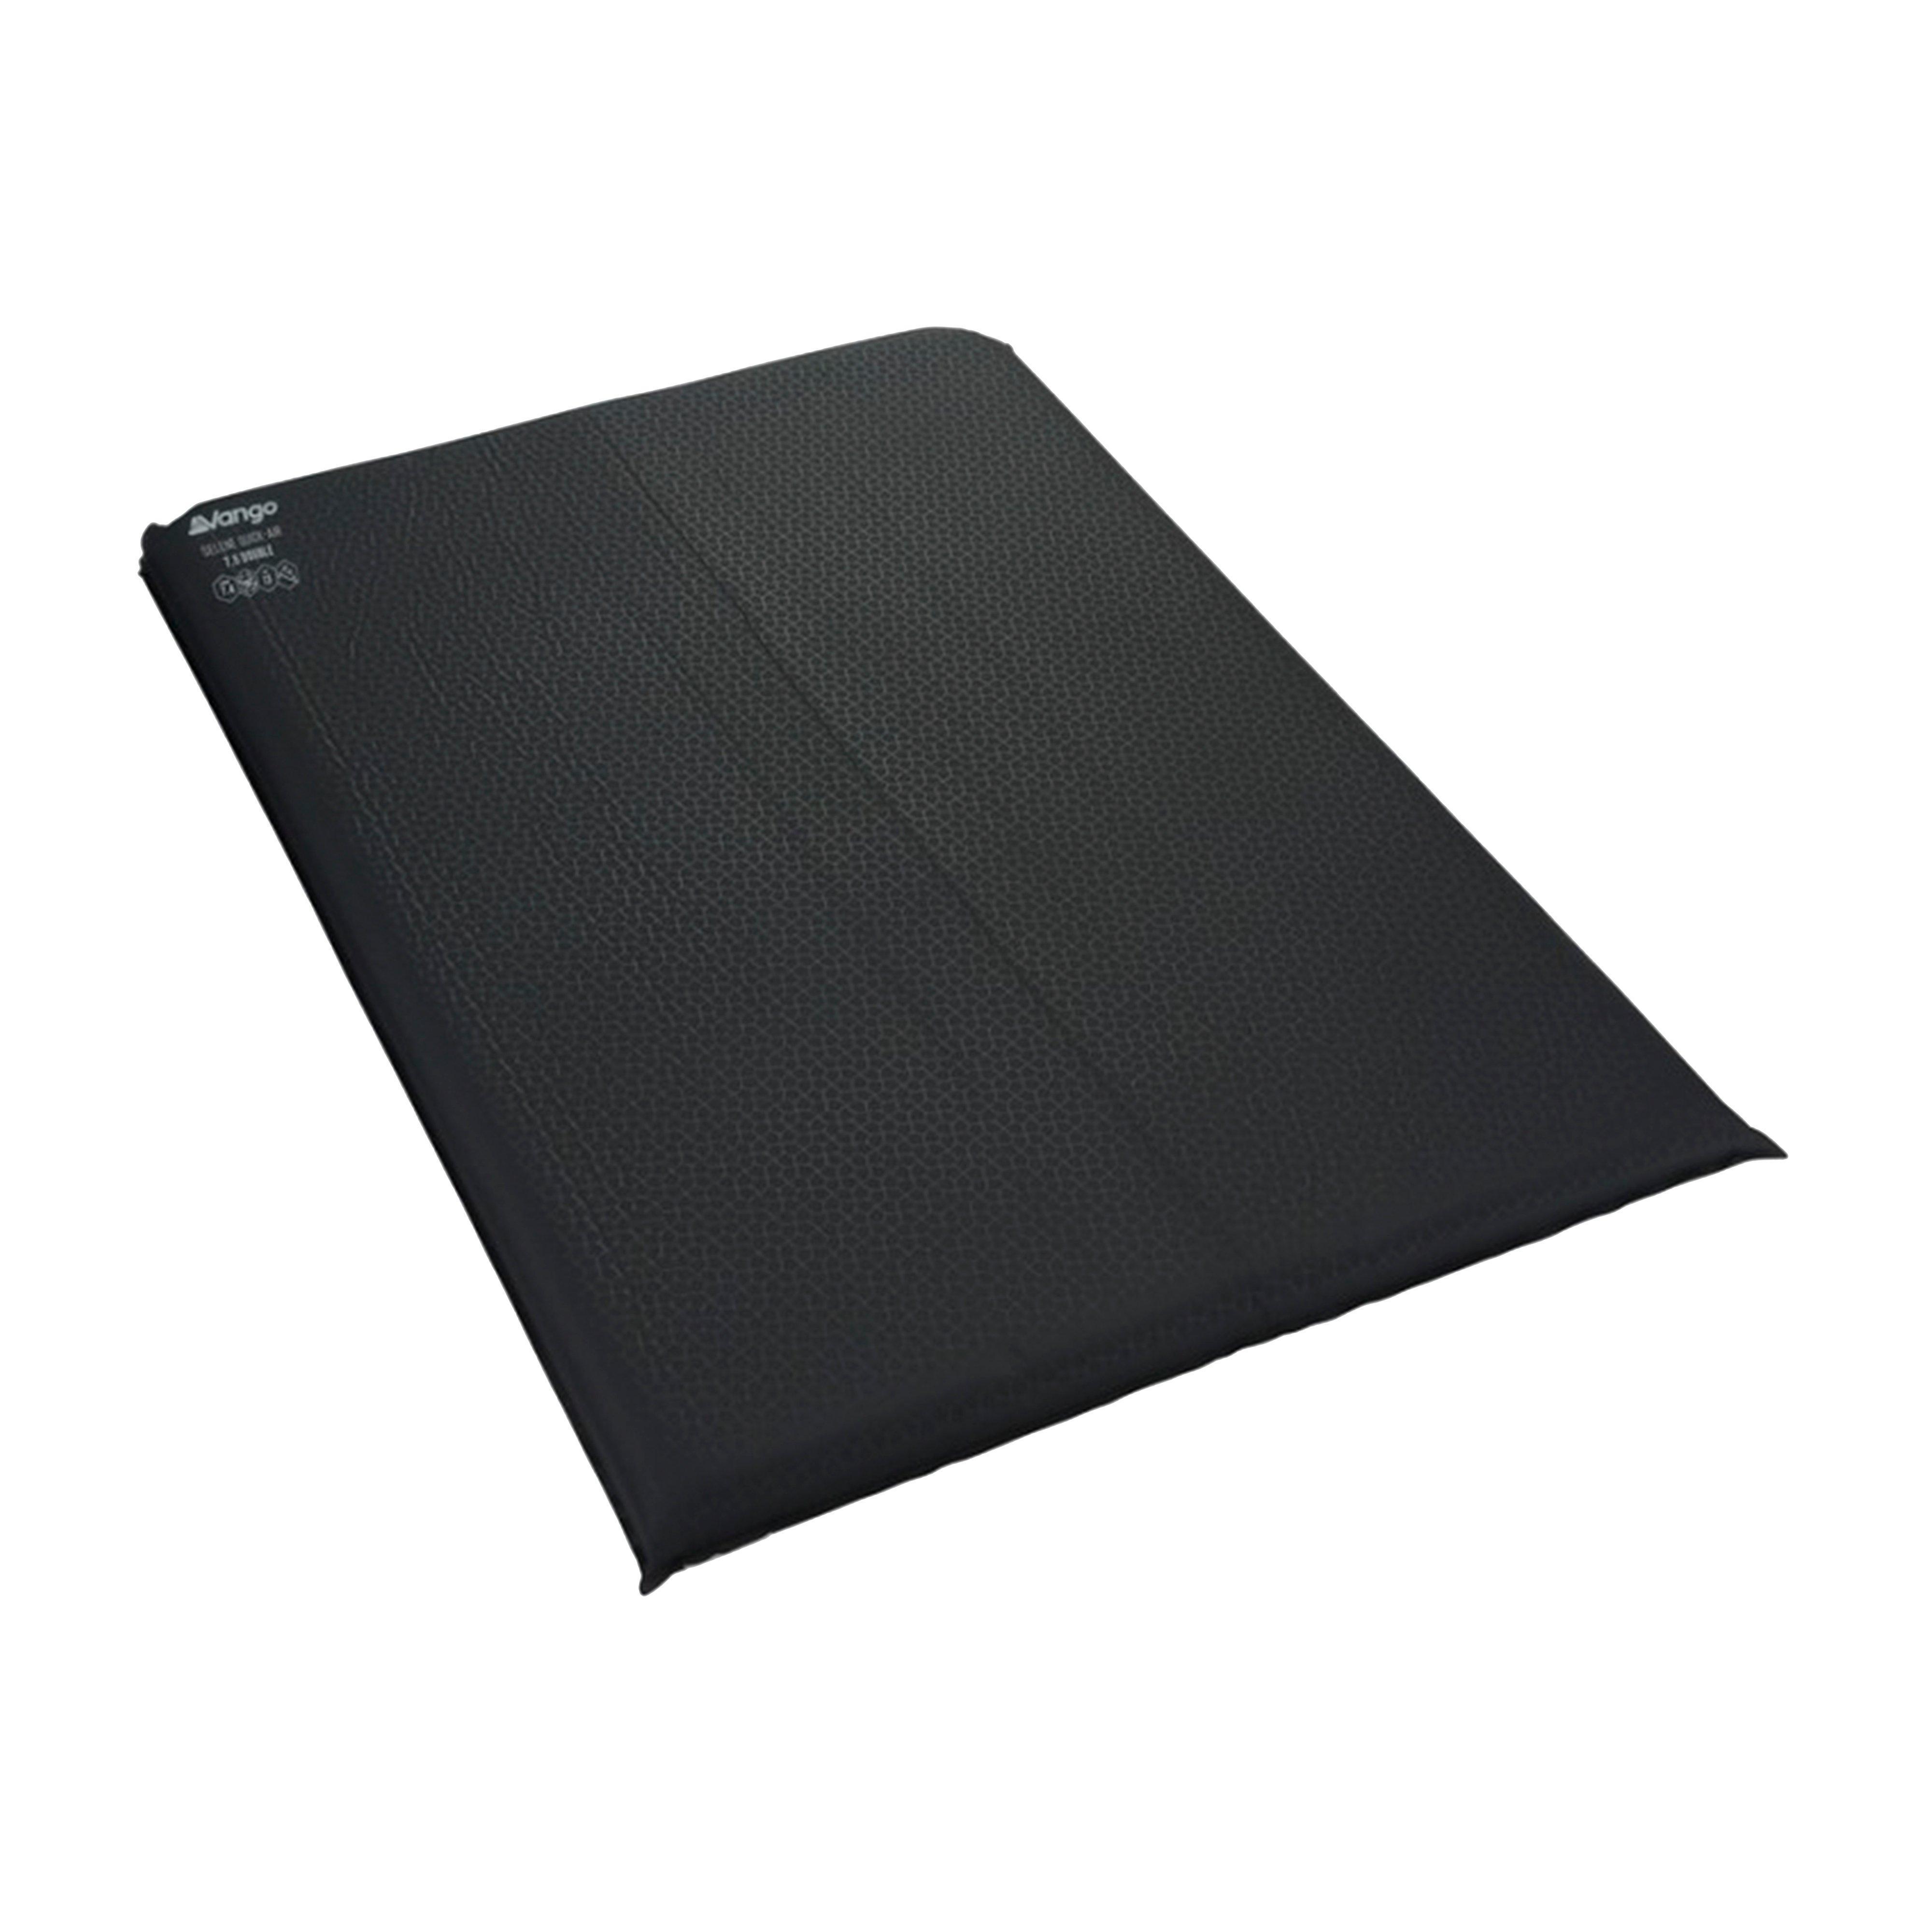 VANGO Selene Quick Air 7.5 Double Sleeping Mat, Grey/GRY